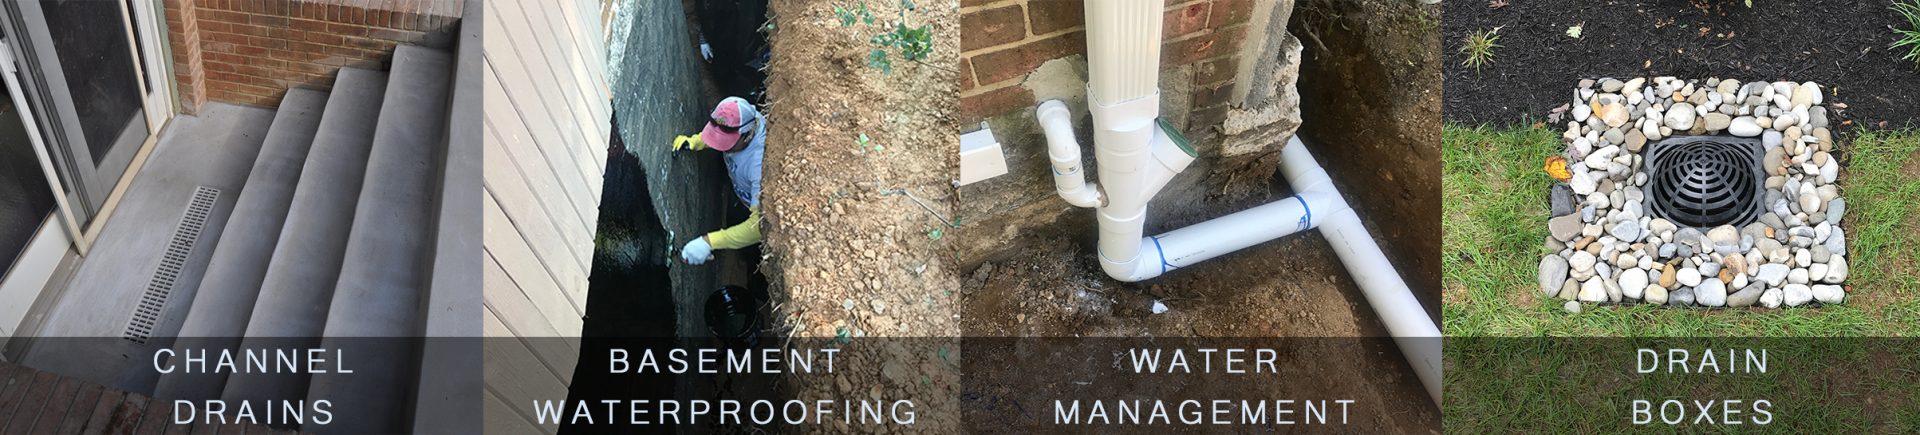 water management drainage repair